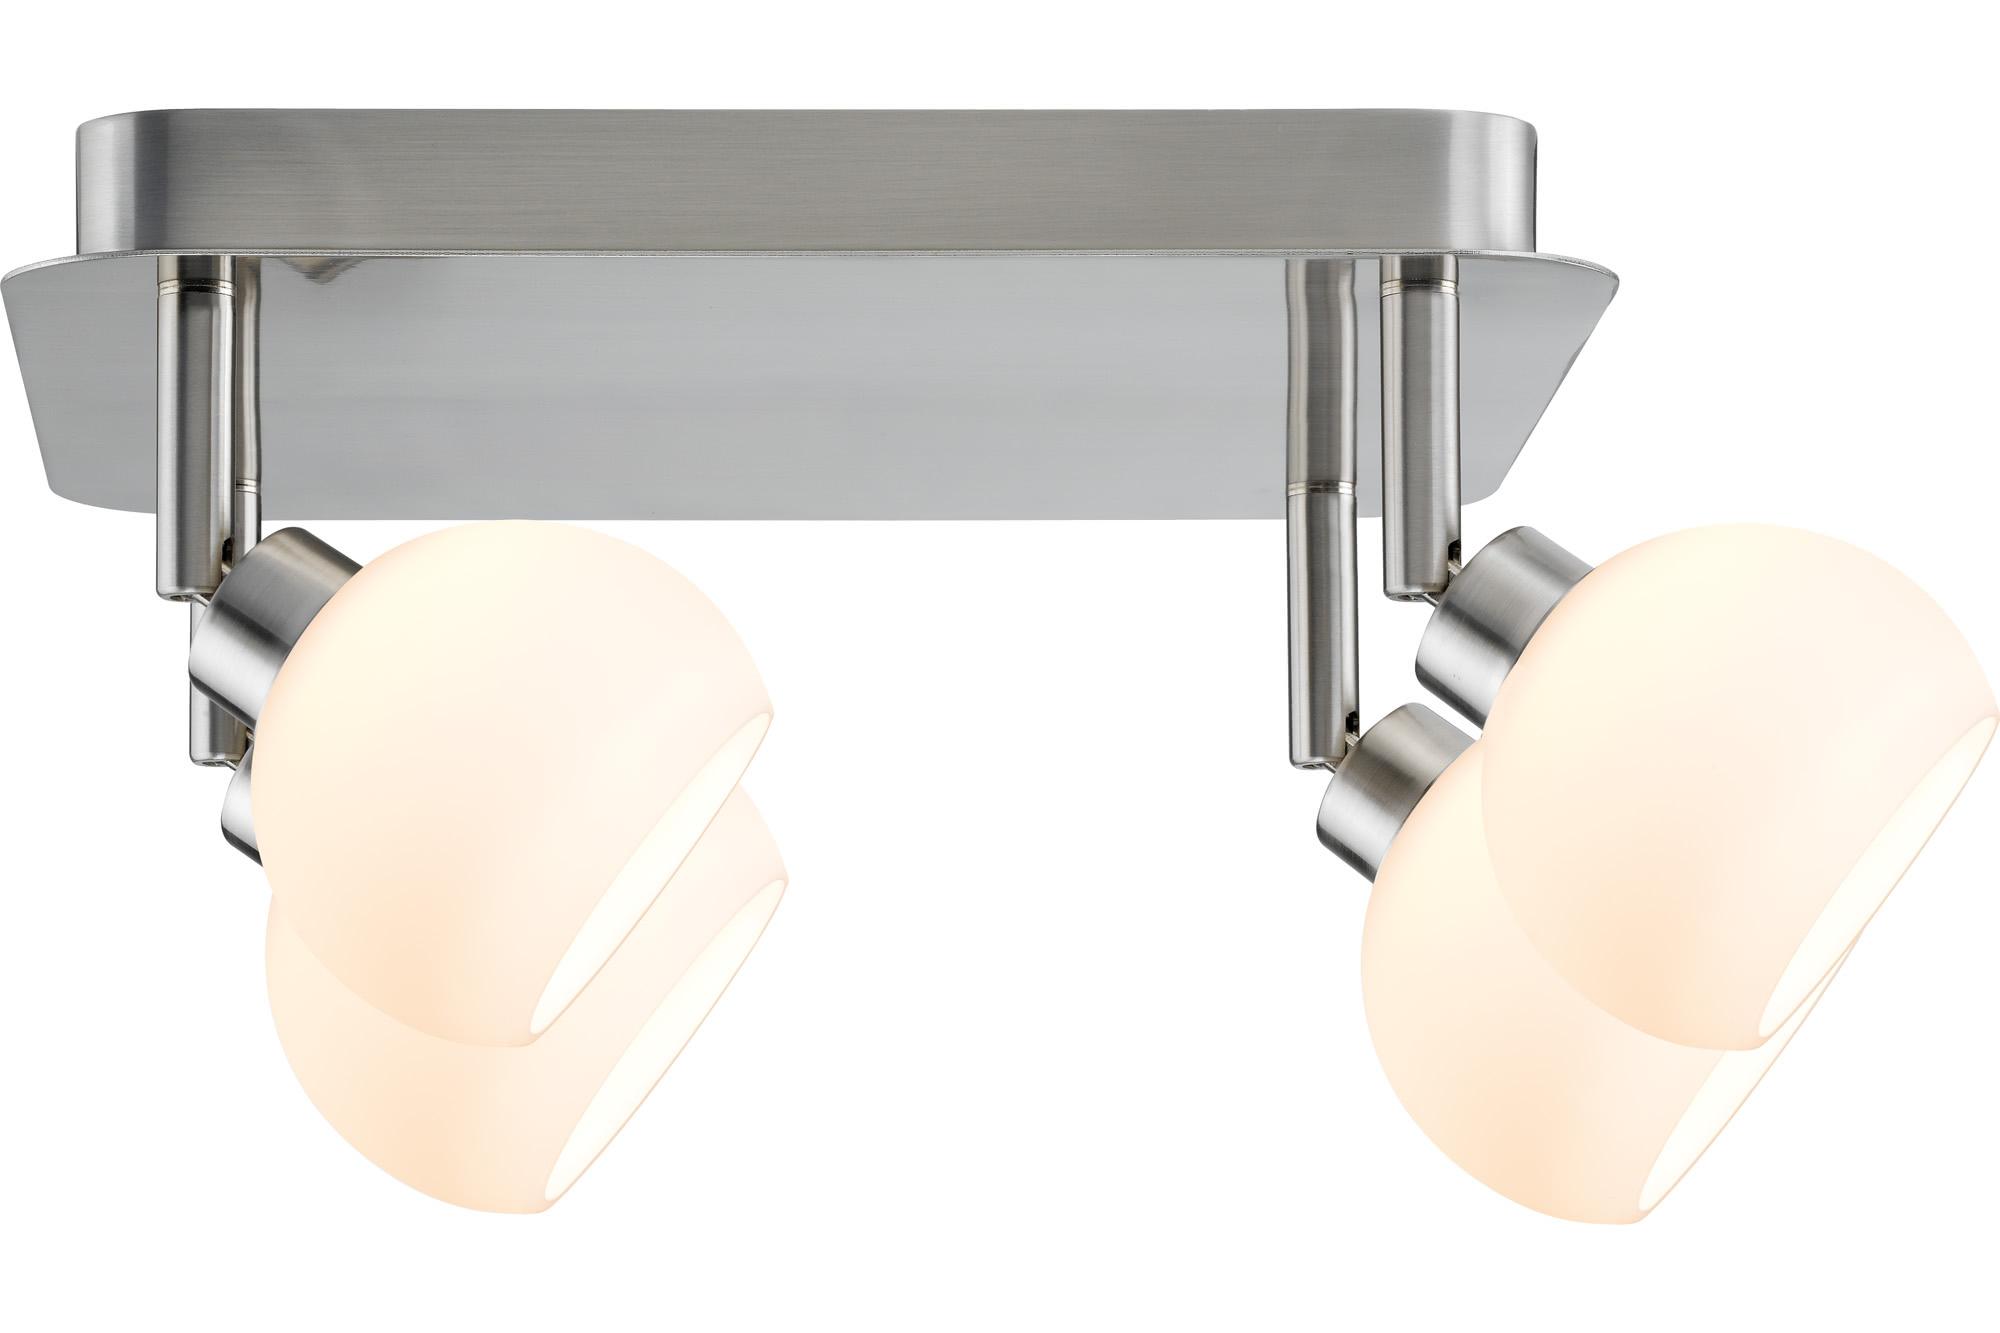 Paulmann. 60297 SL Wolbi LED Rondell 4x3W GZ10 Eis-g/Ws